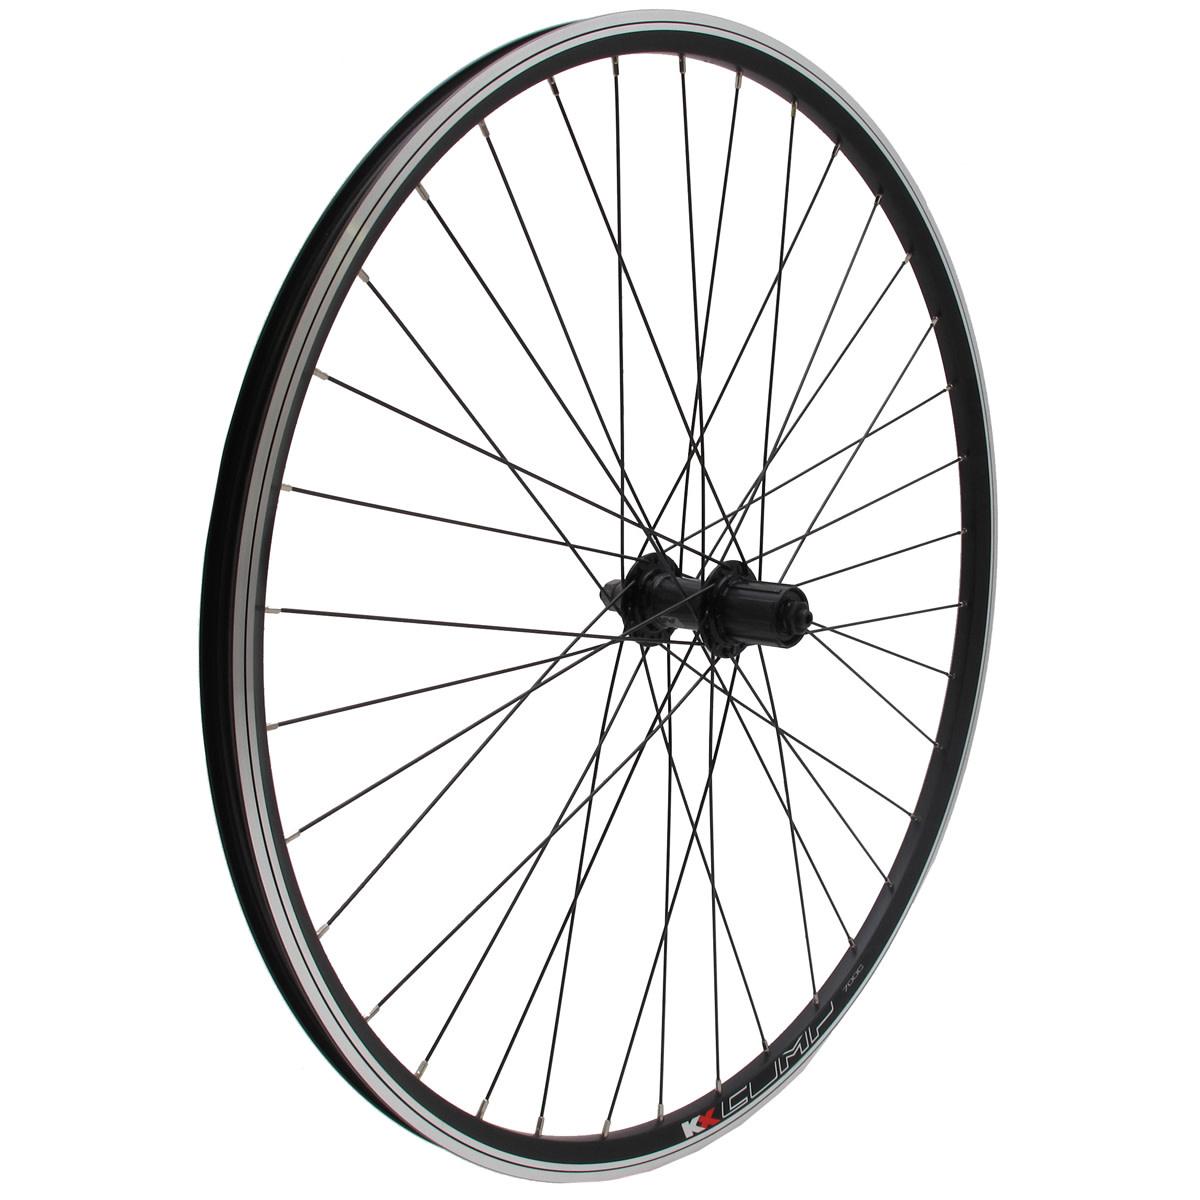 "KX wheels KX MTB 26"" Doublewall Q/R Cassette Wheel Disc Brake (Rear) - Silver"